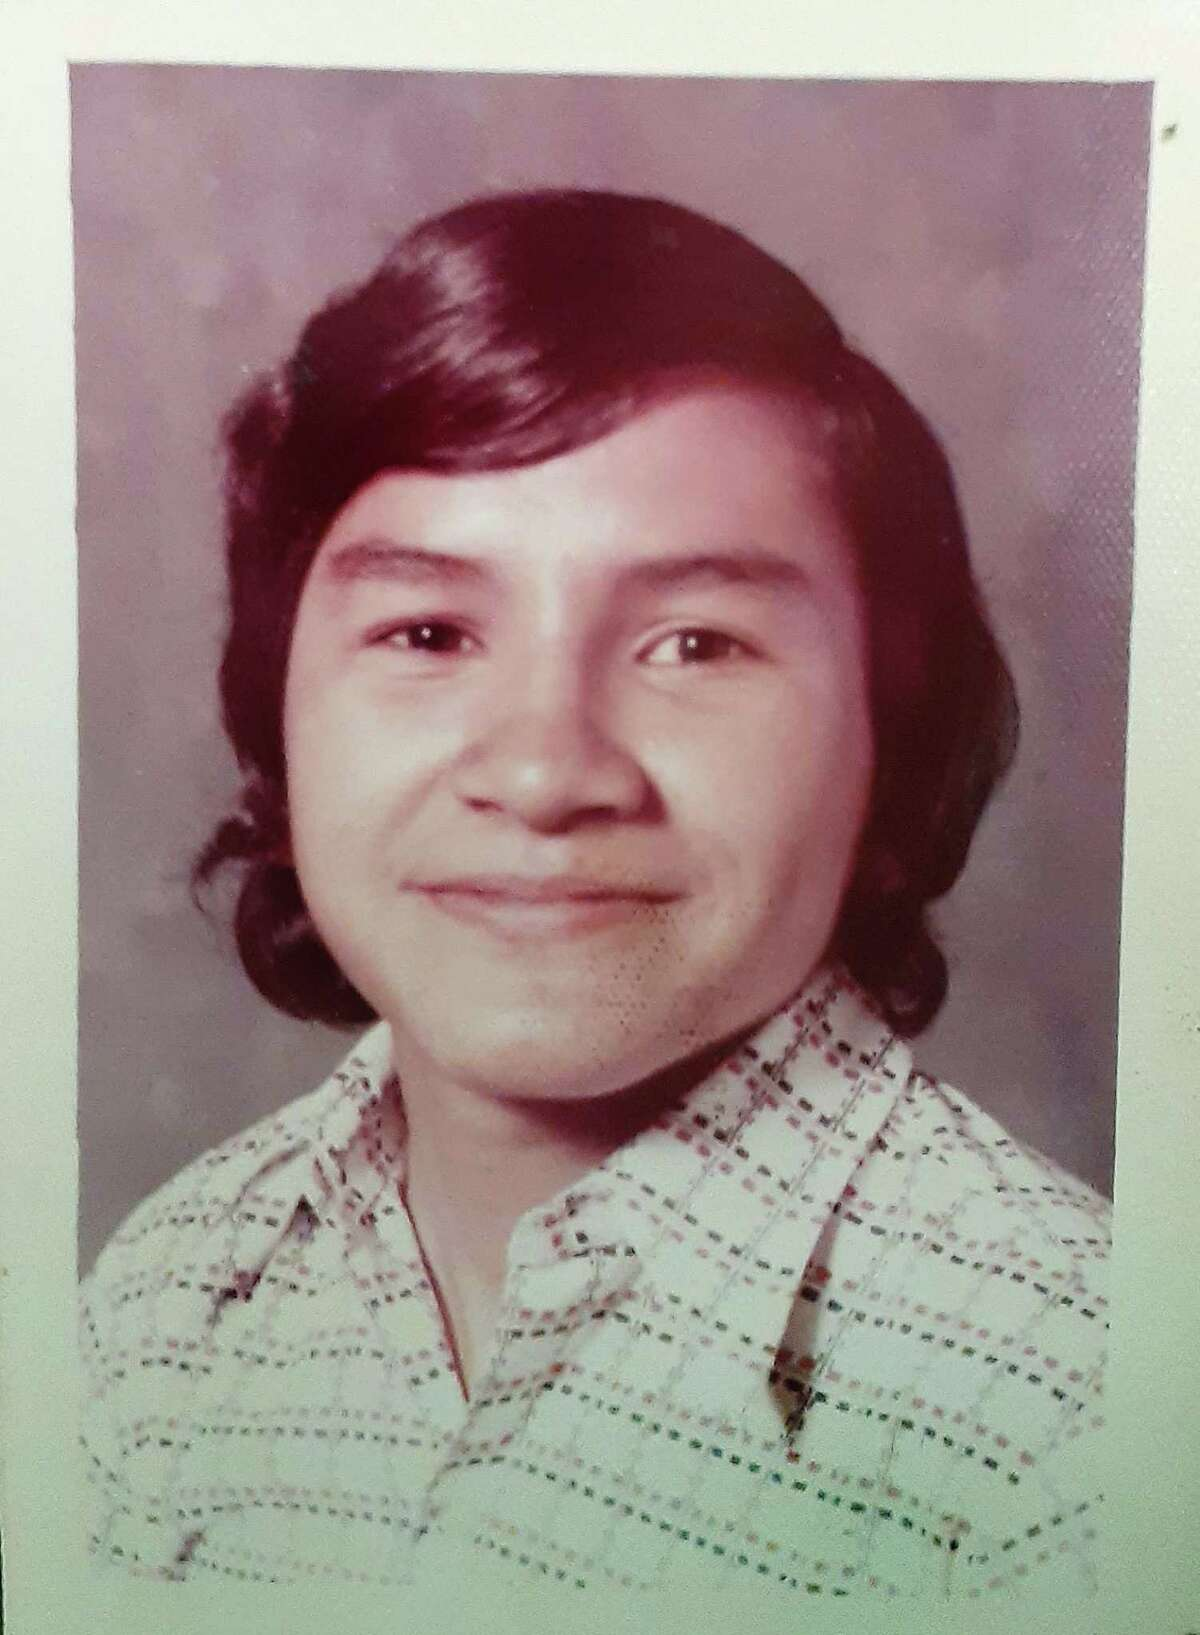 Jose Homero Gonzalez Jr. at 16 years of age.